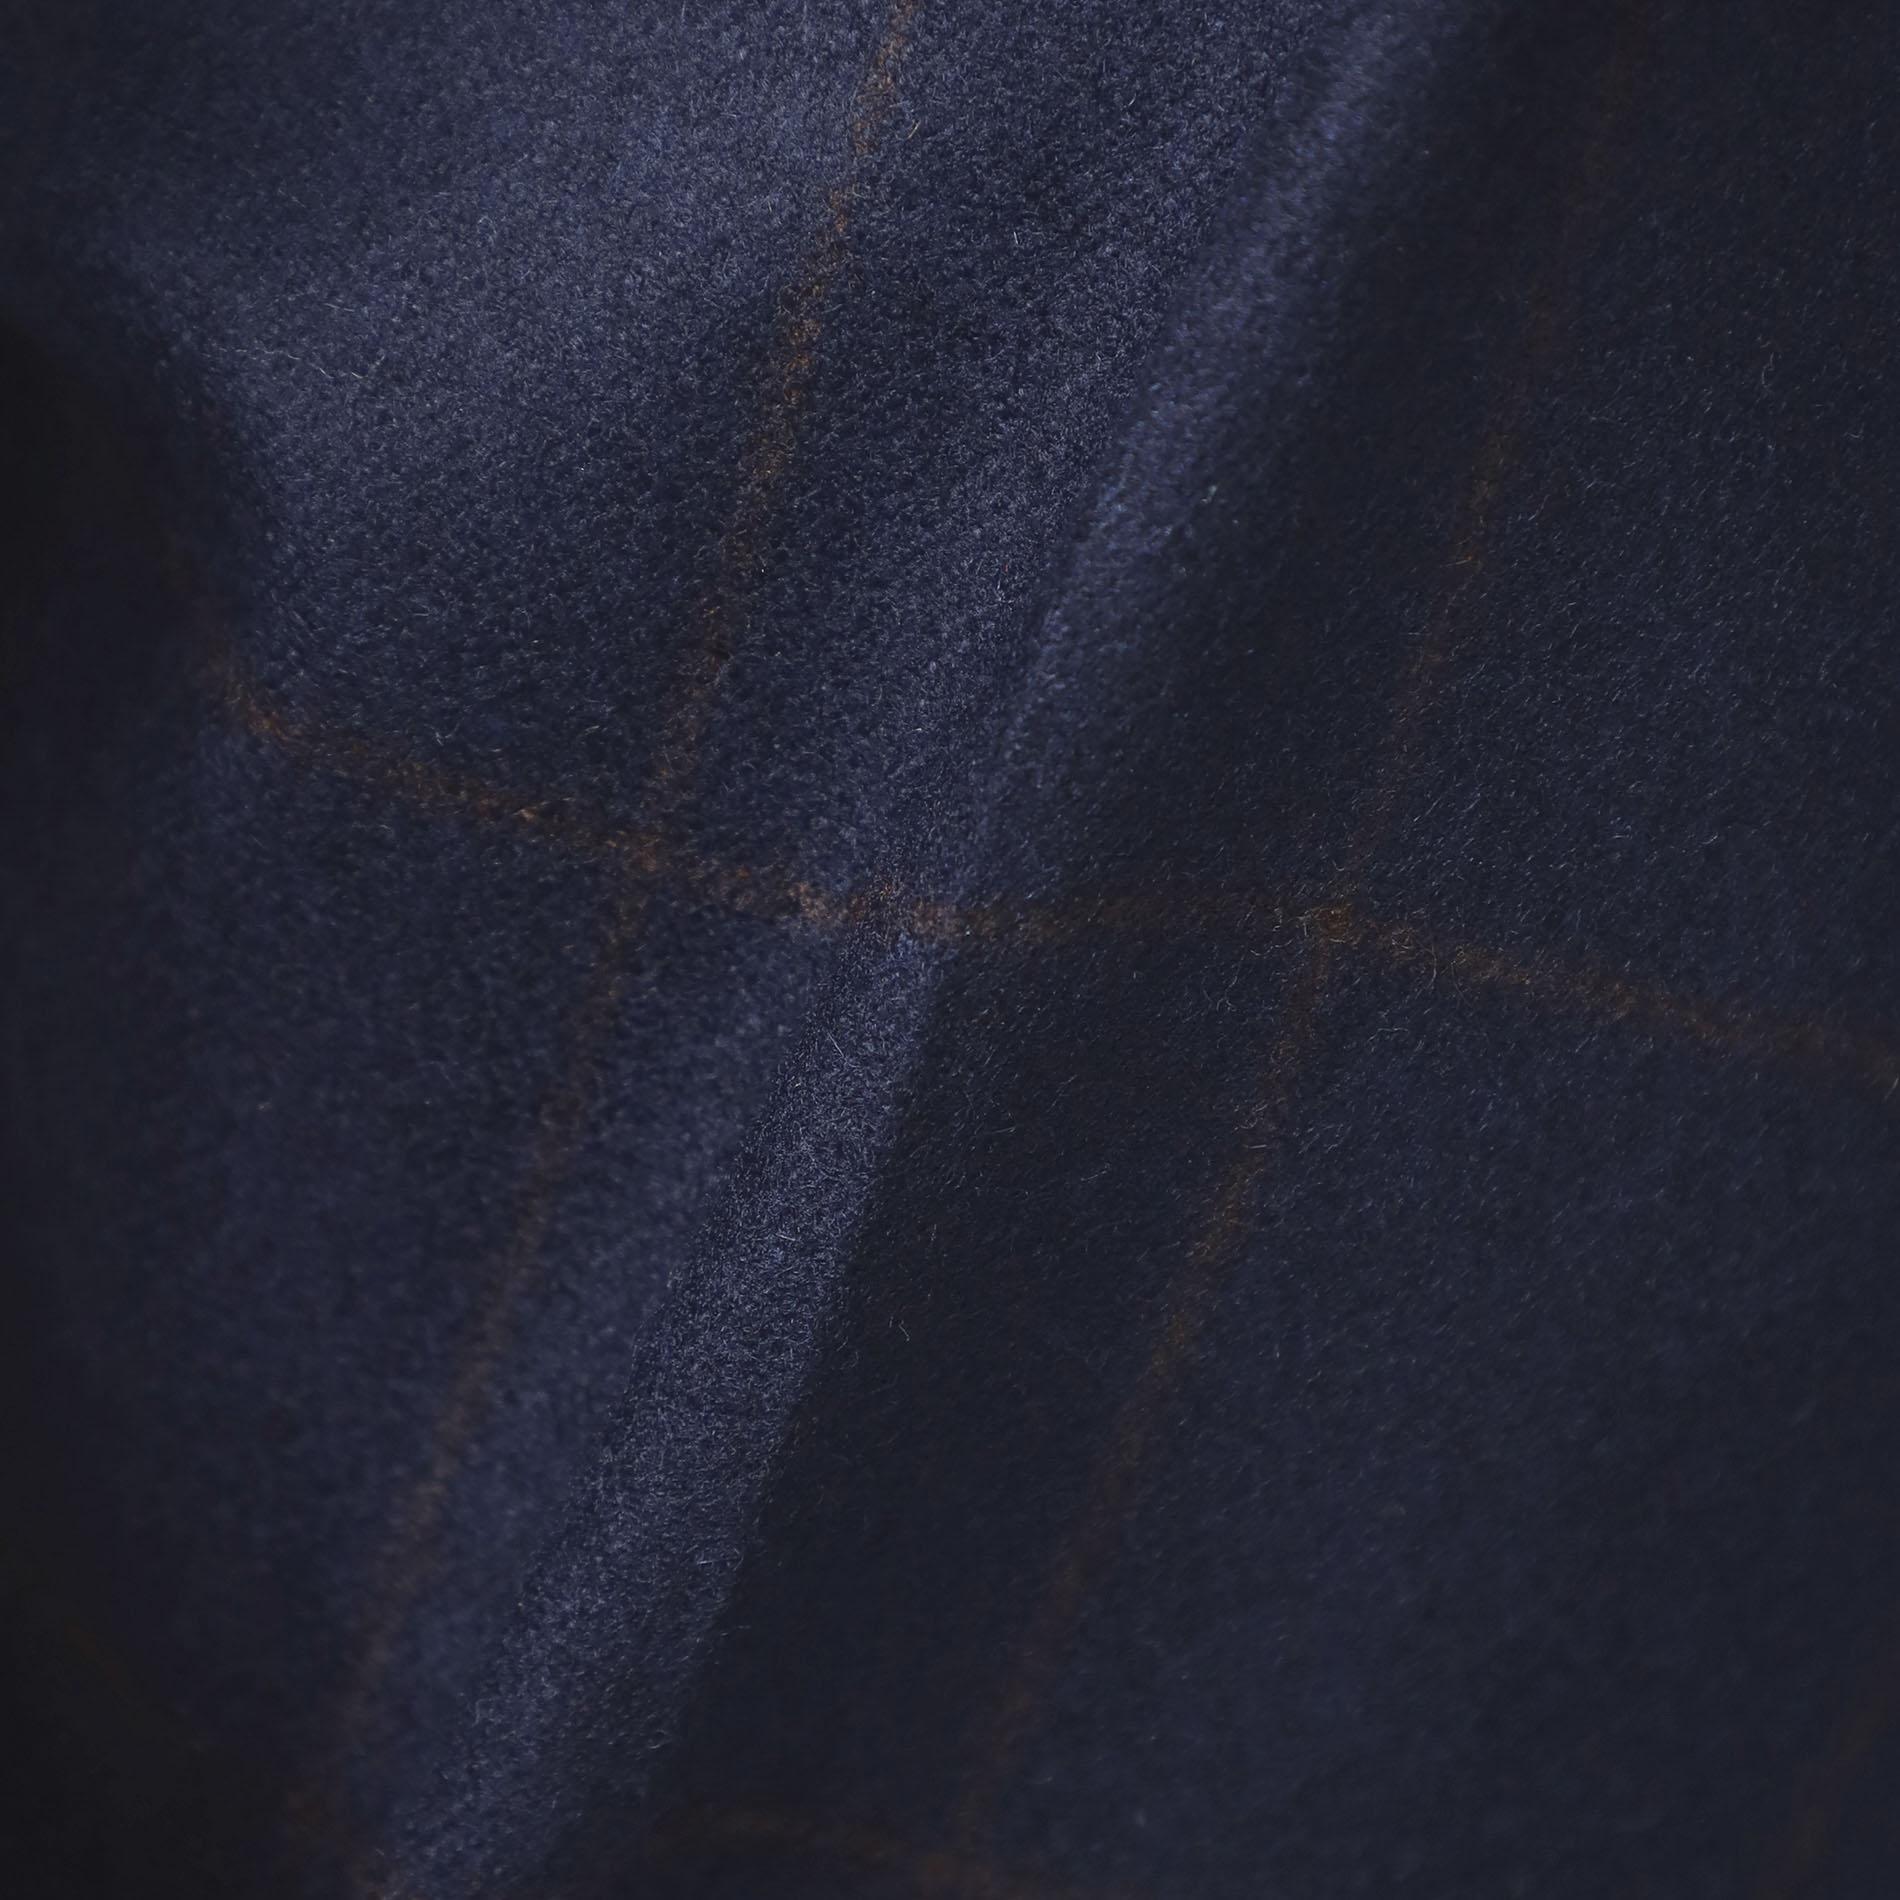 【The Essential Collection】ウールアンゴラフラノパンツ